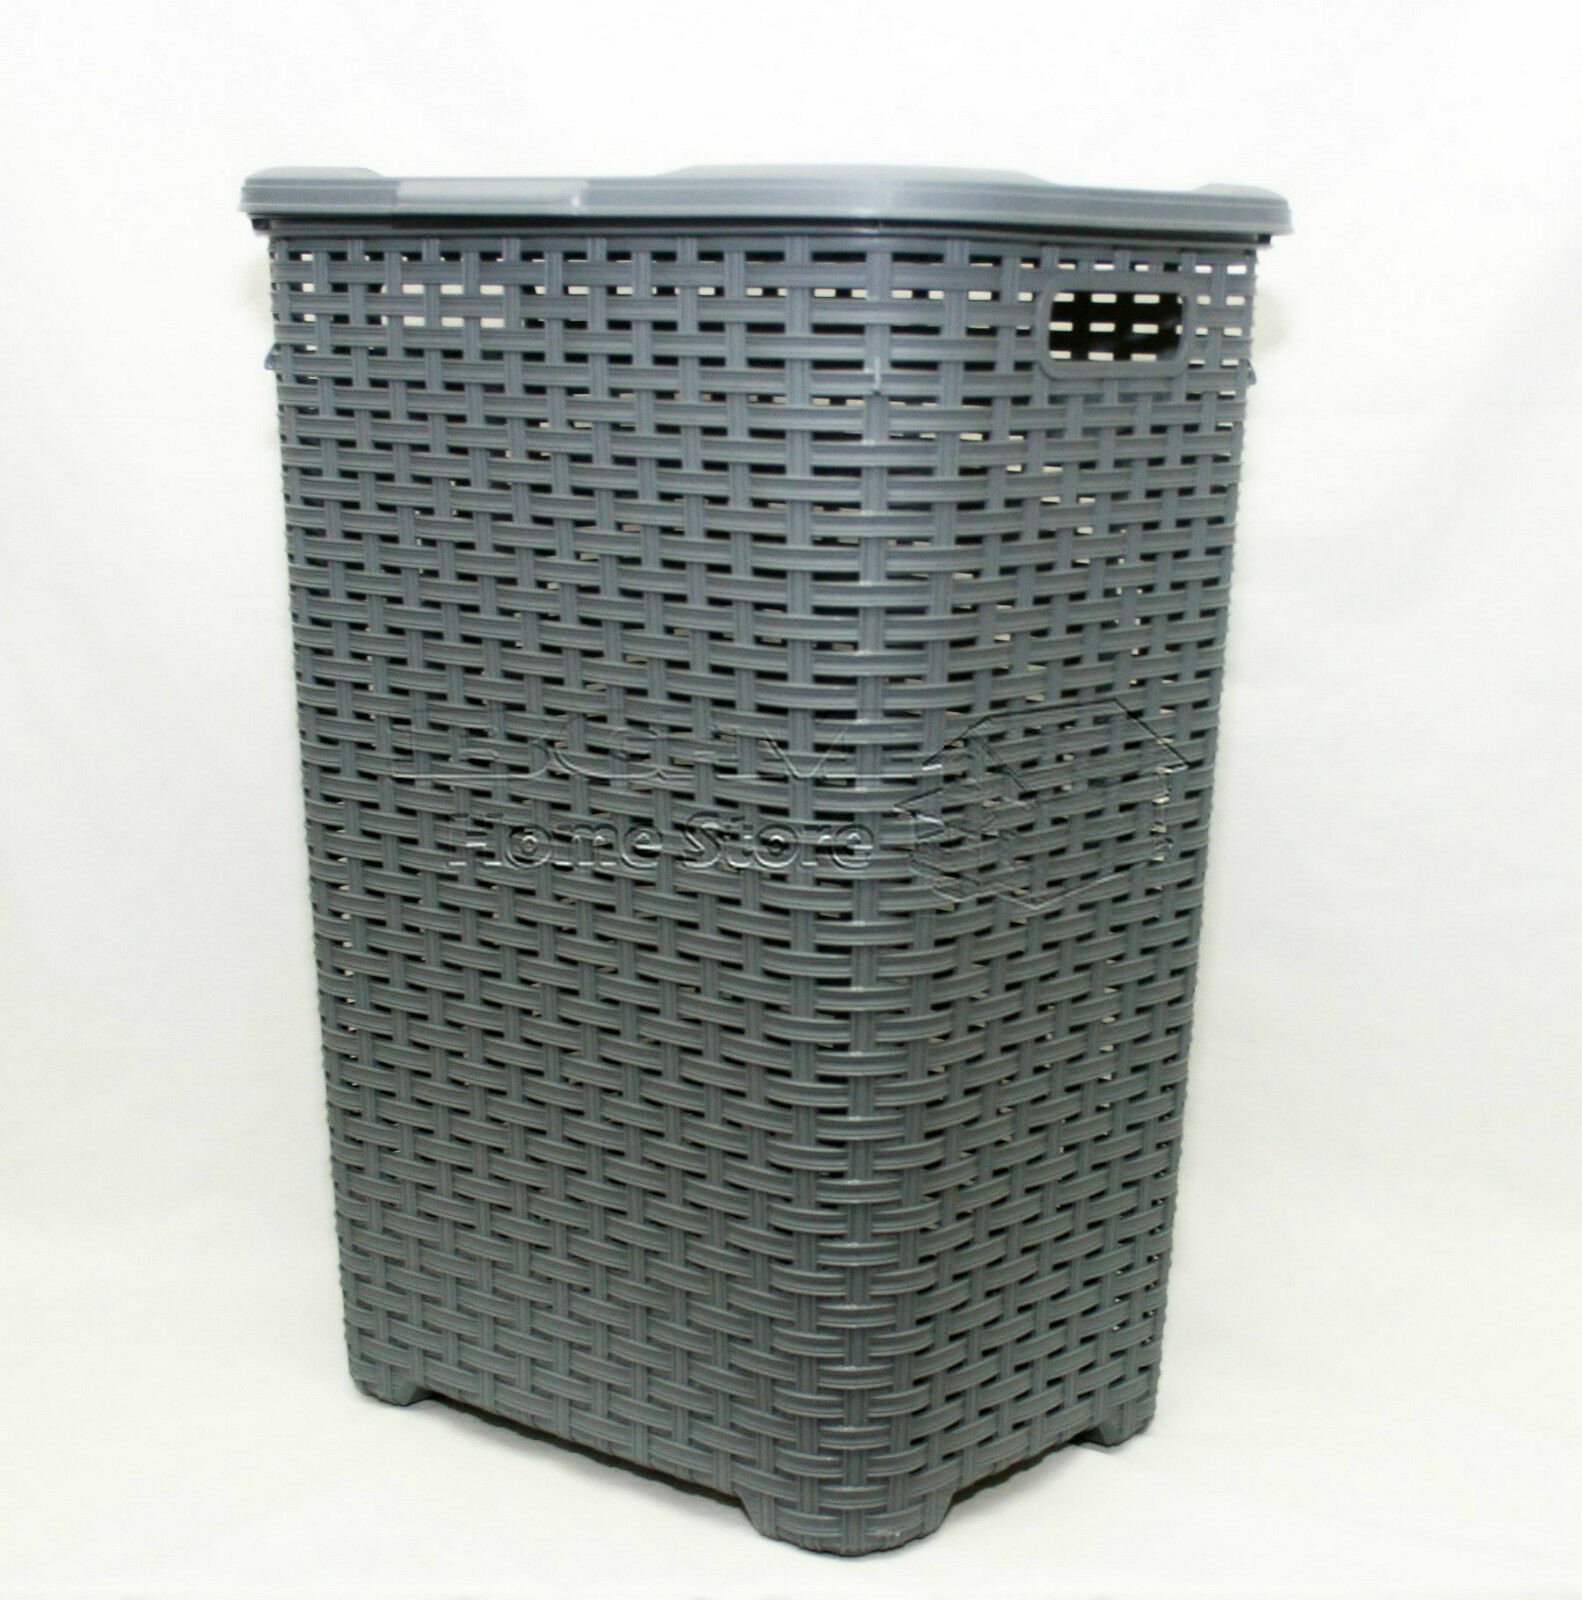 9cae8dfed54 2X 60L Woven Style Rattan Plastic Laundry Basket Bathroom Bin ...